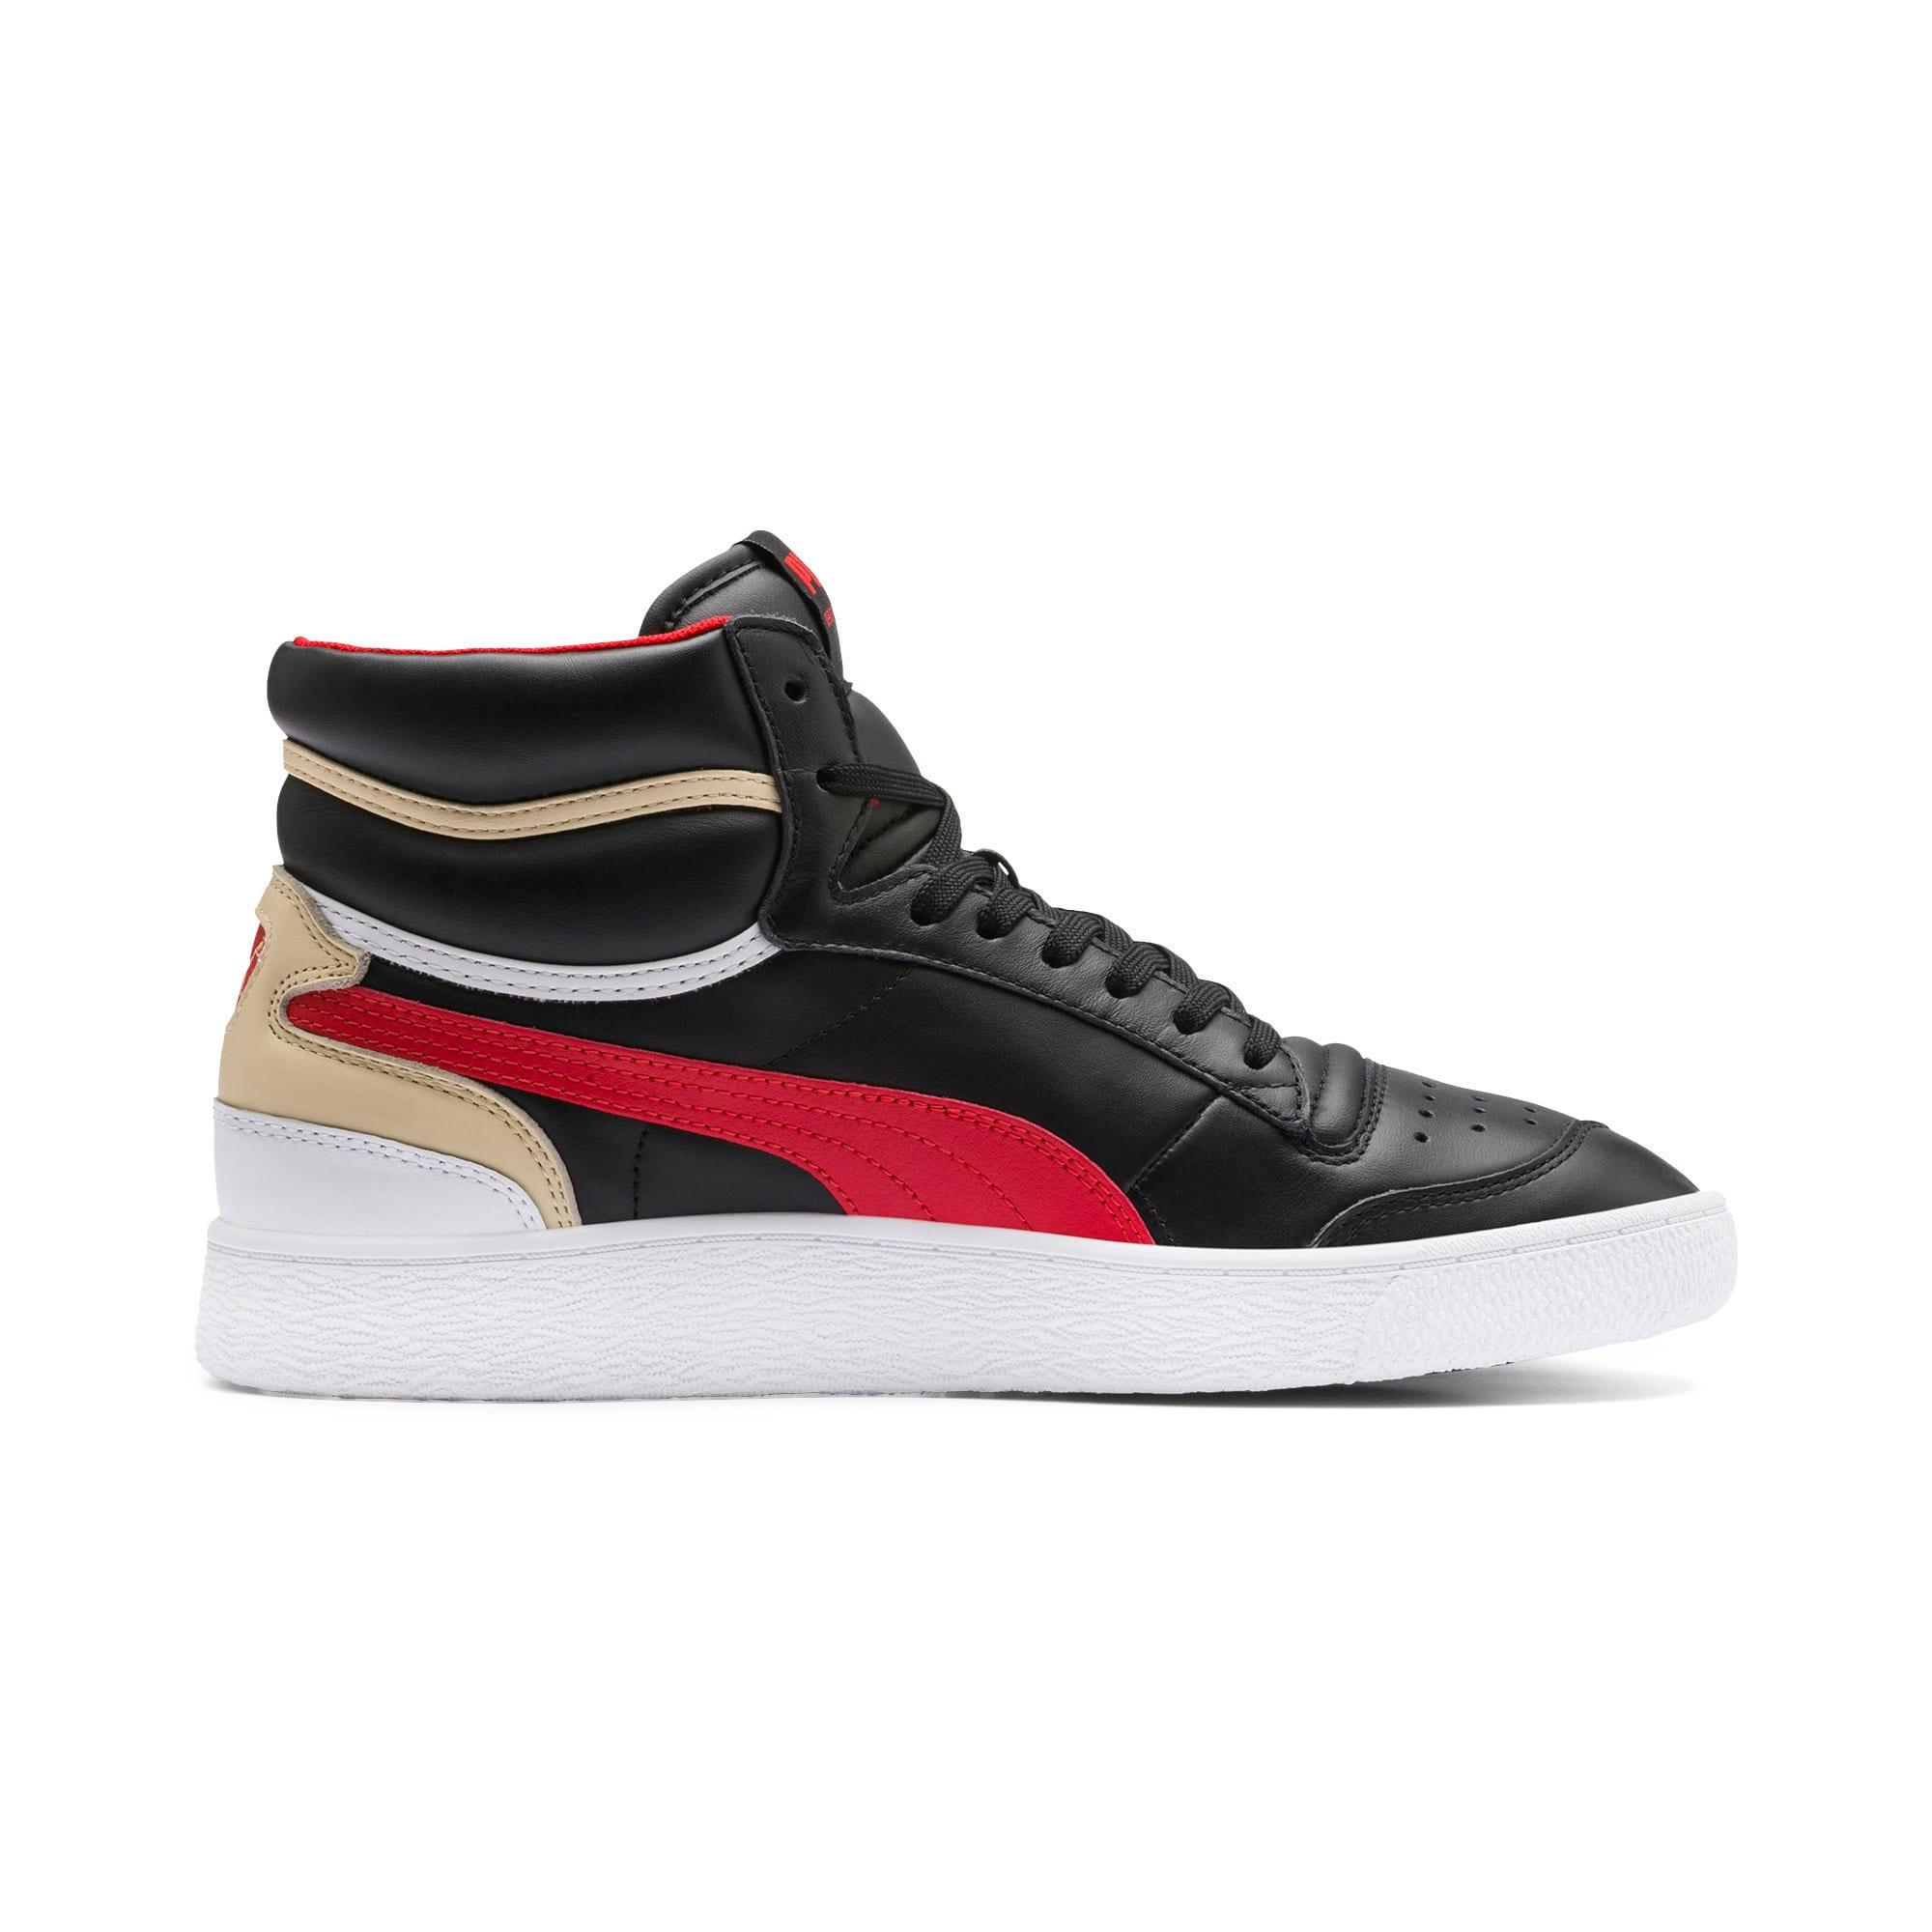 Thumbnail 5 of Ralph Sampson Mid Sneakers, PBlack-High Risk Red-PWhite, medium